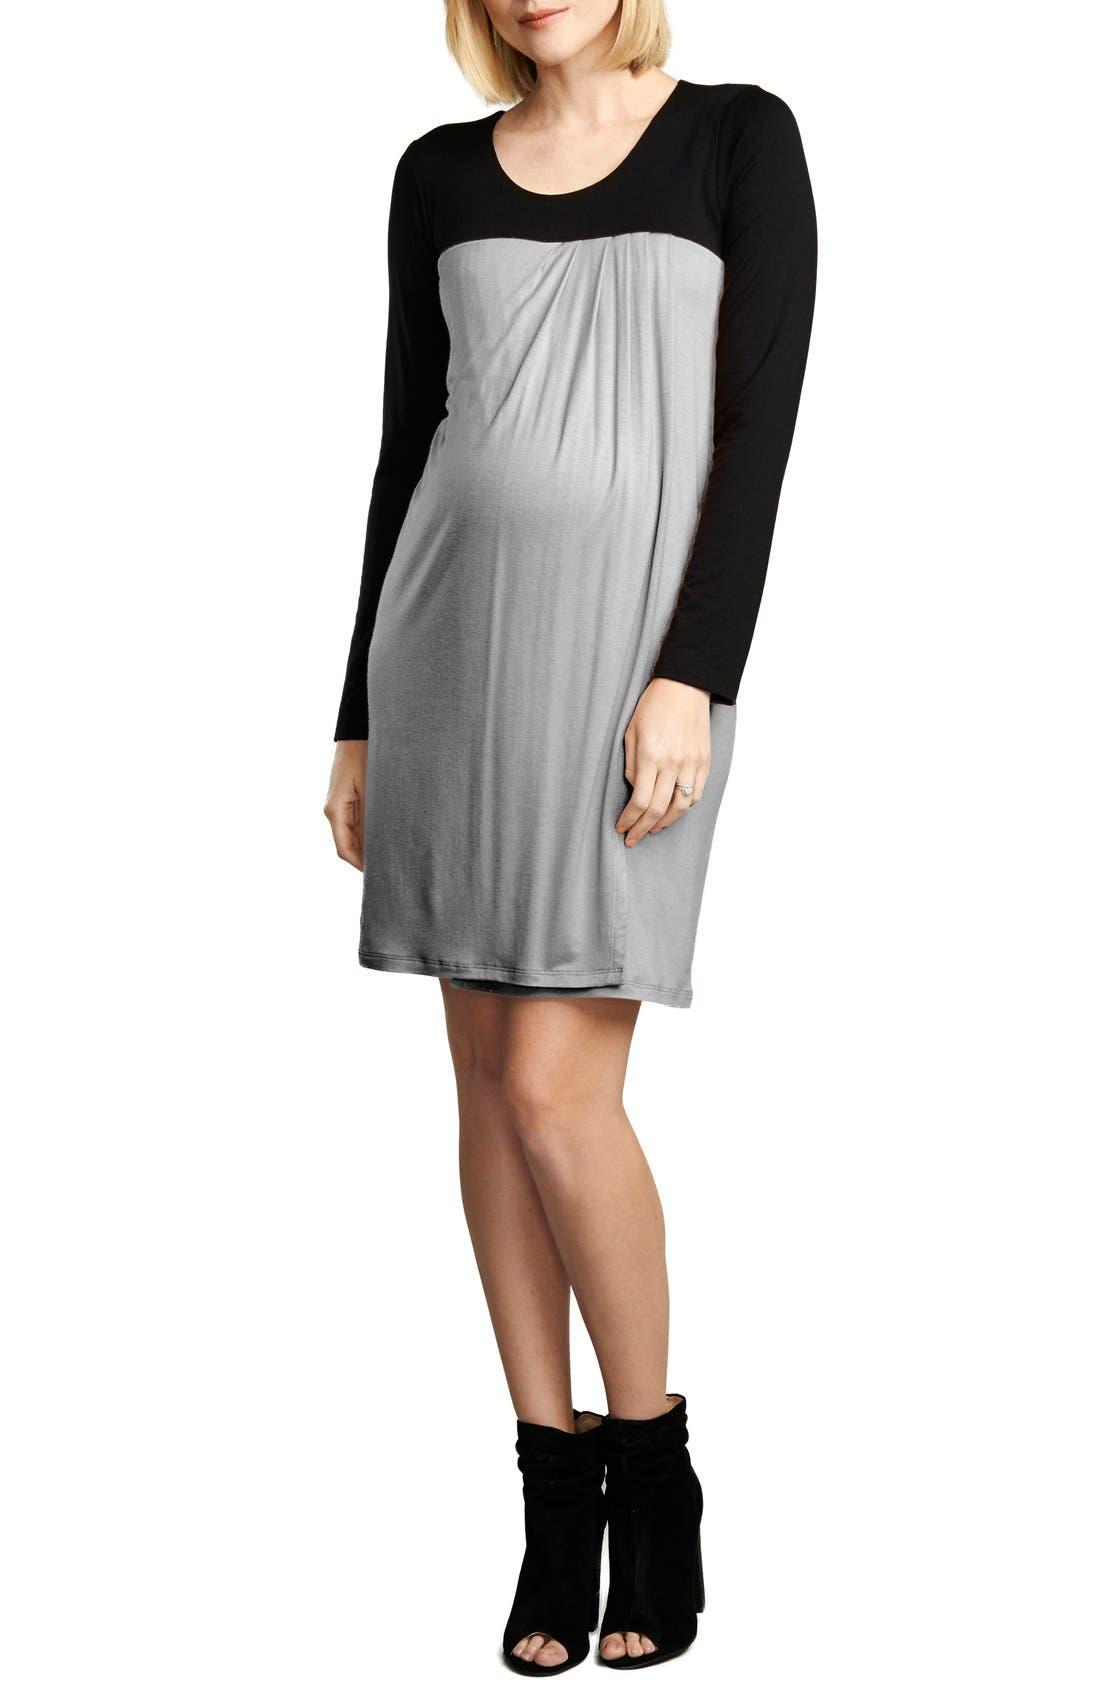 Maternal America Baby Doll Maternity/nursing Dress